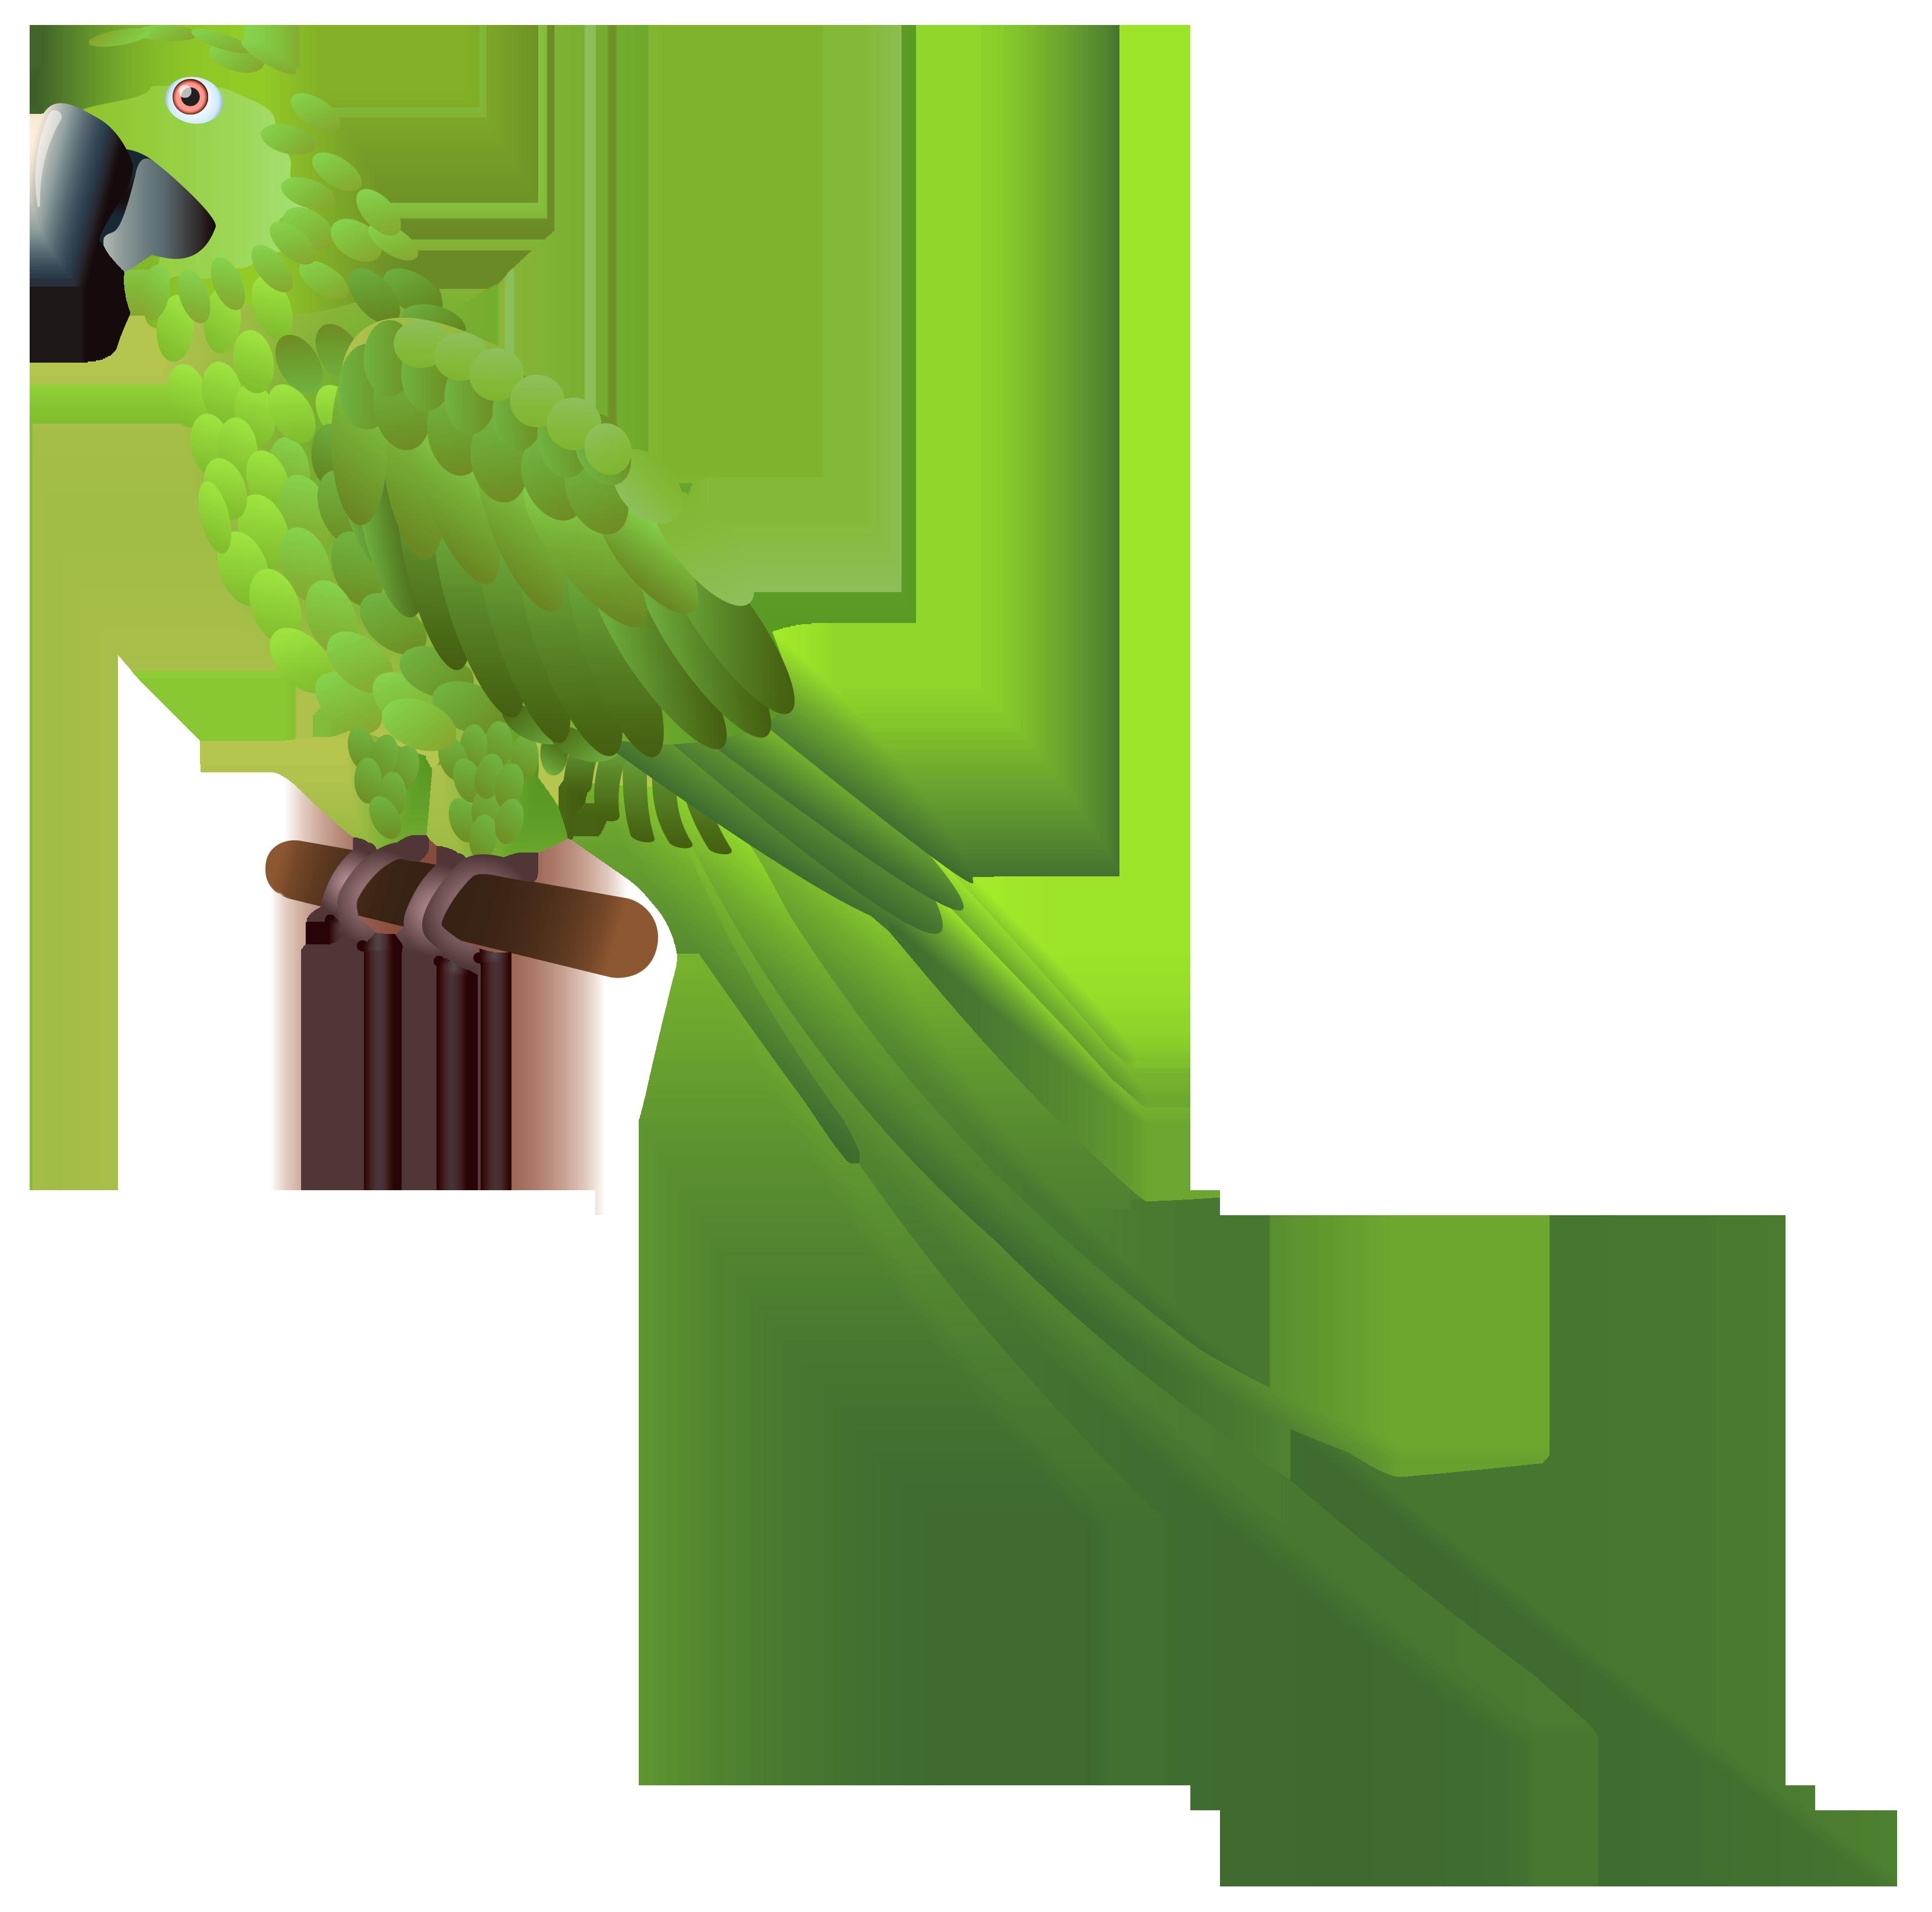 Pet clipart yellow parrot. Green png best web